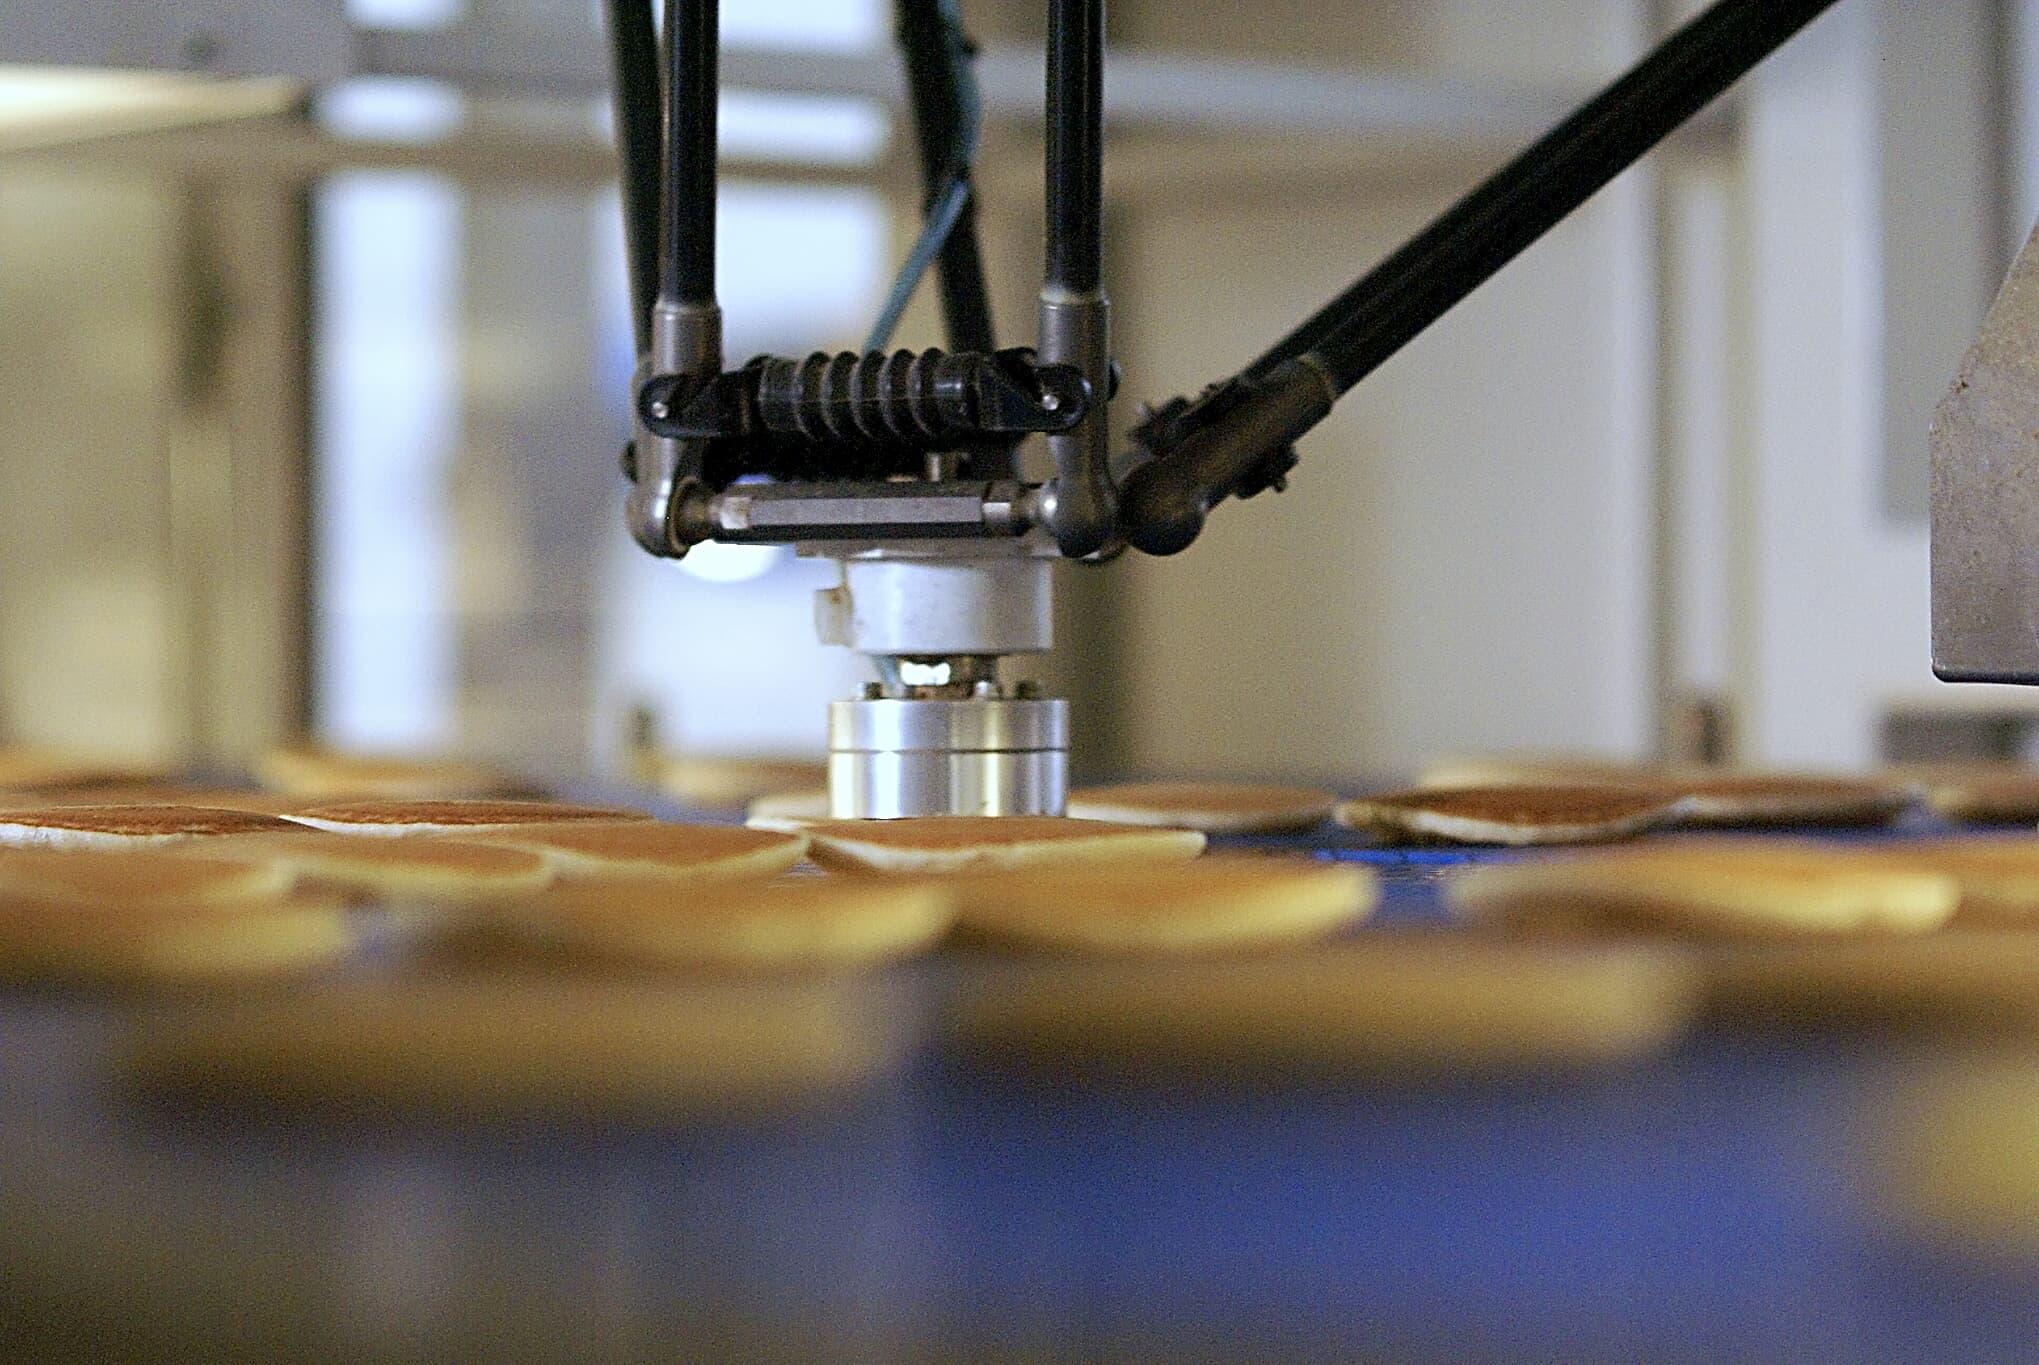 ABB IRB 360 FlexPicker picking pancakes at Honeytop Specialty Foods